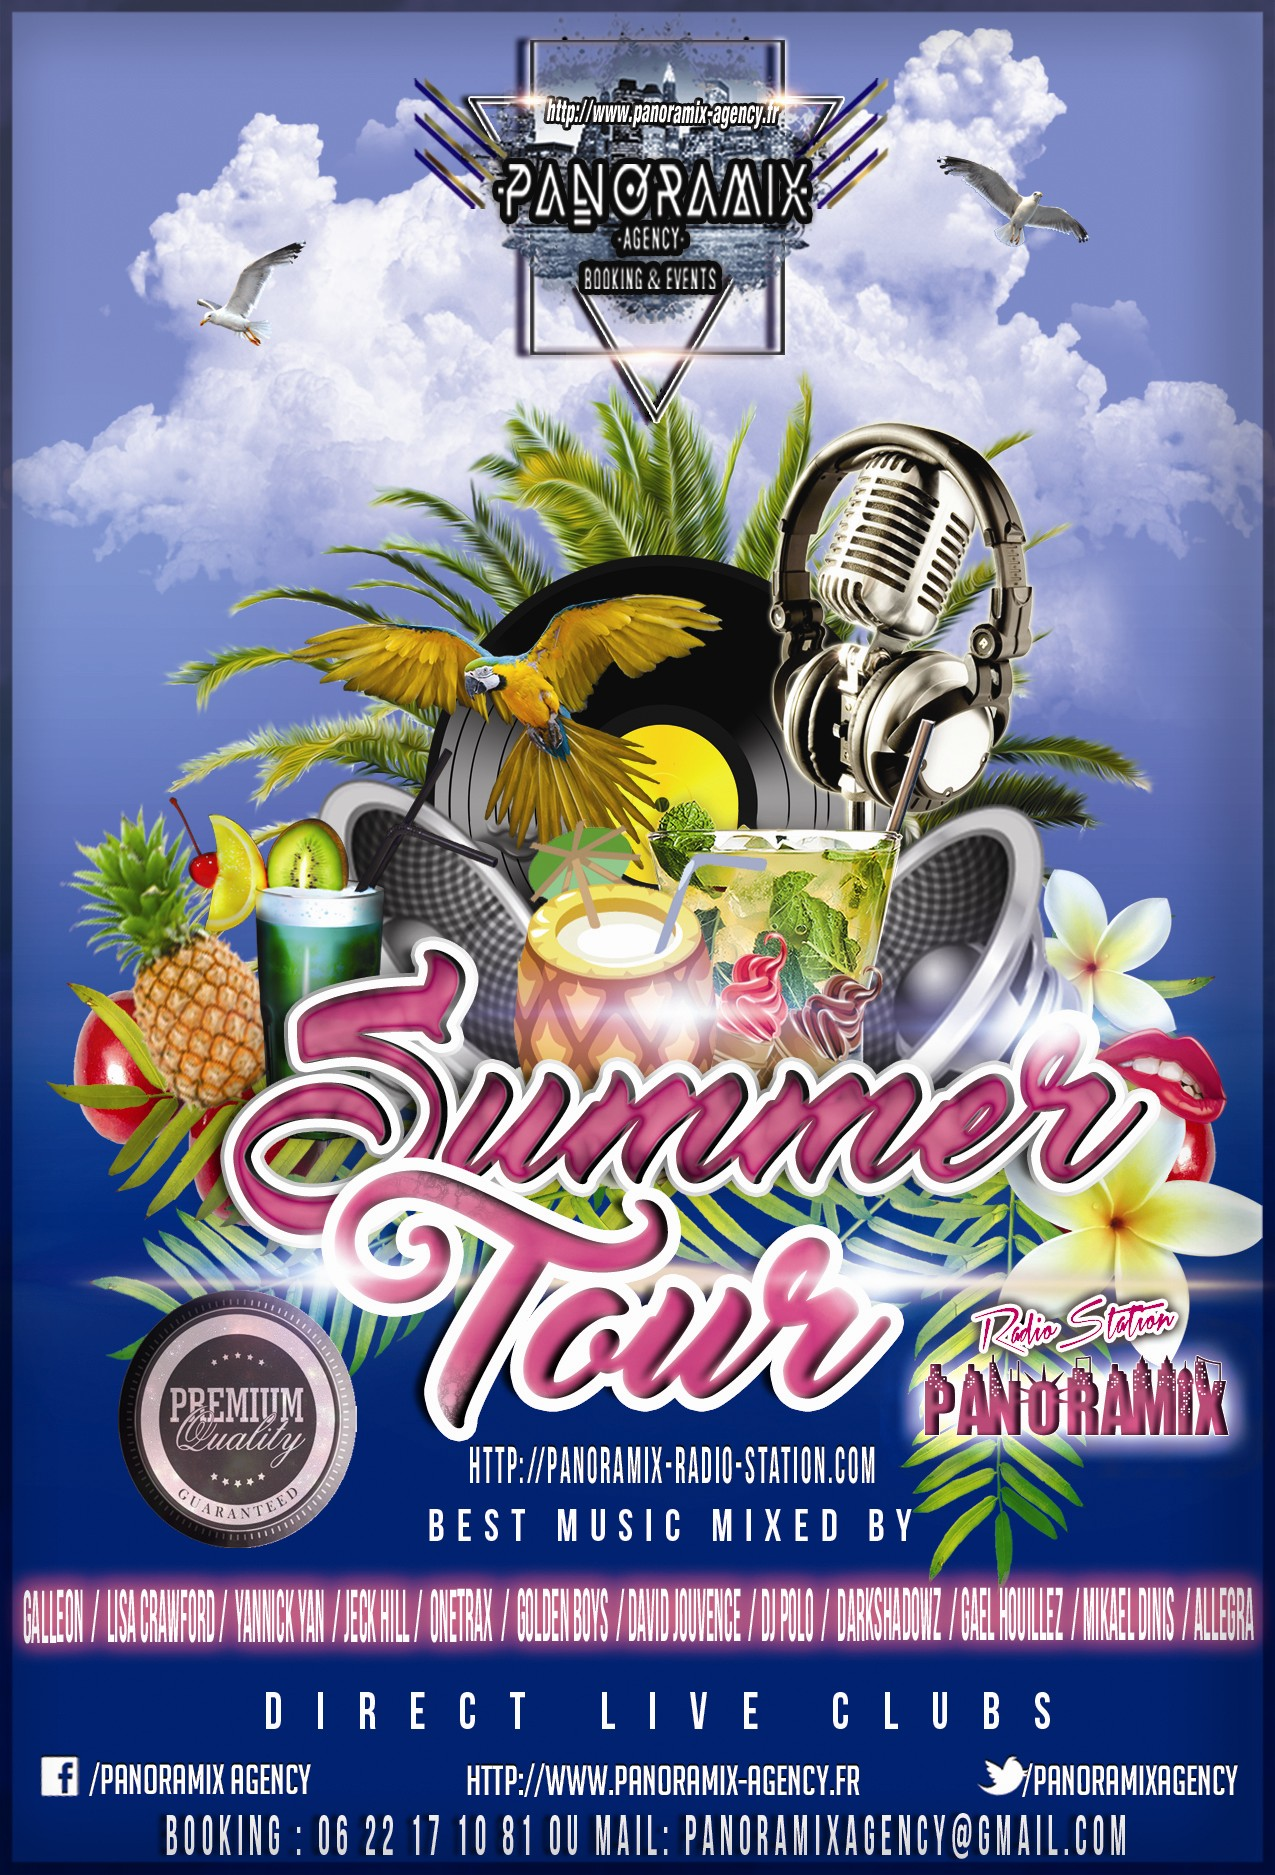 http://panoramix-radio-station.com/wp-content/uploads/2017/07/summer-TOUR-2017-PANORAMIX-AGENCY-3.jpg